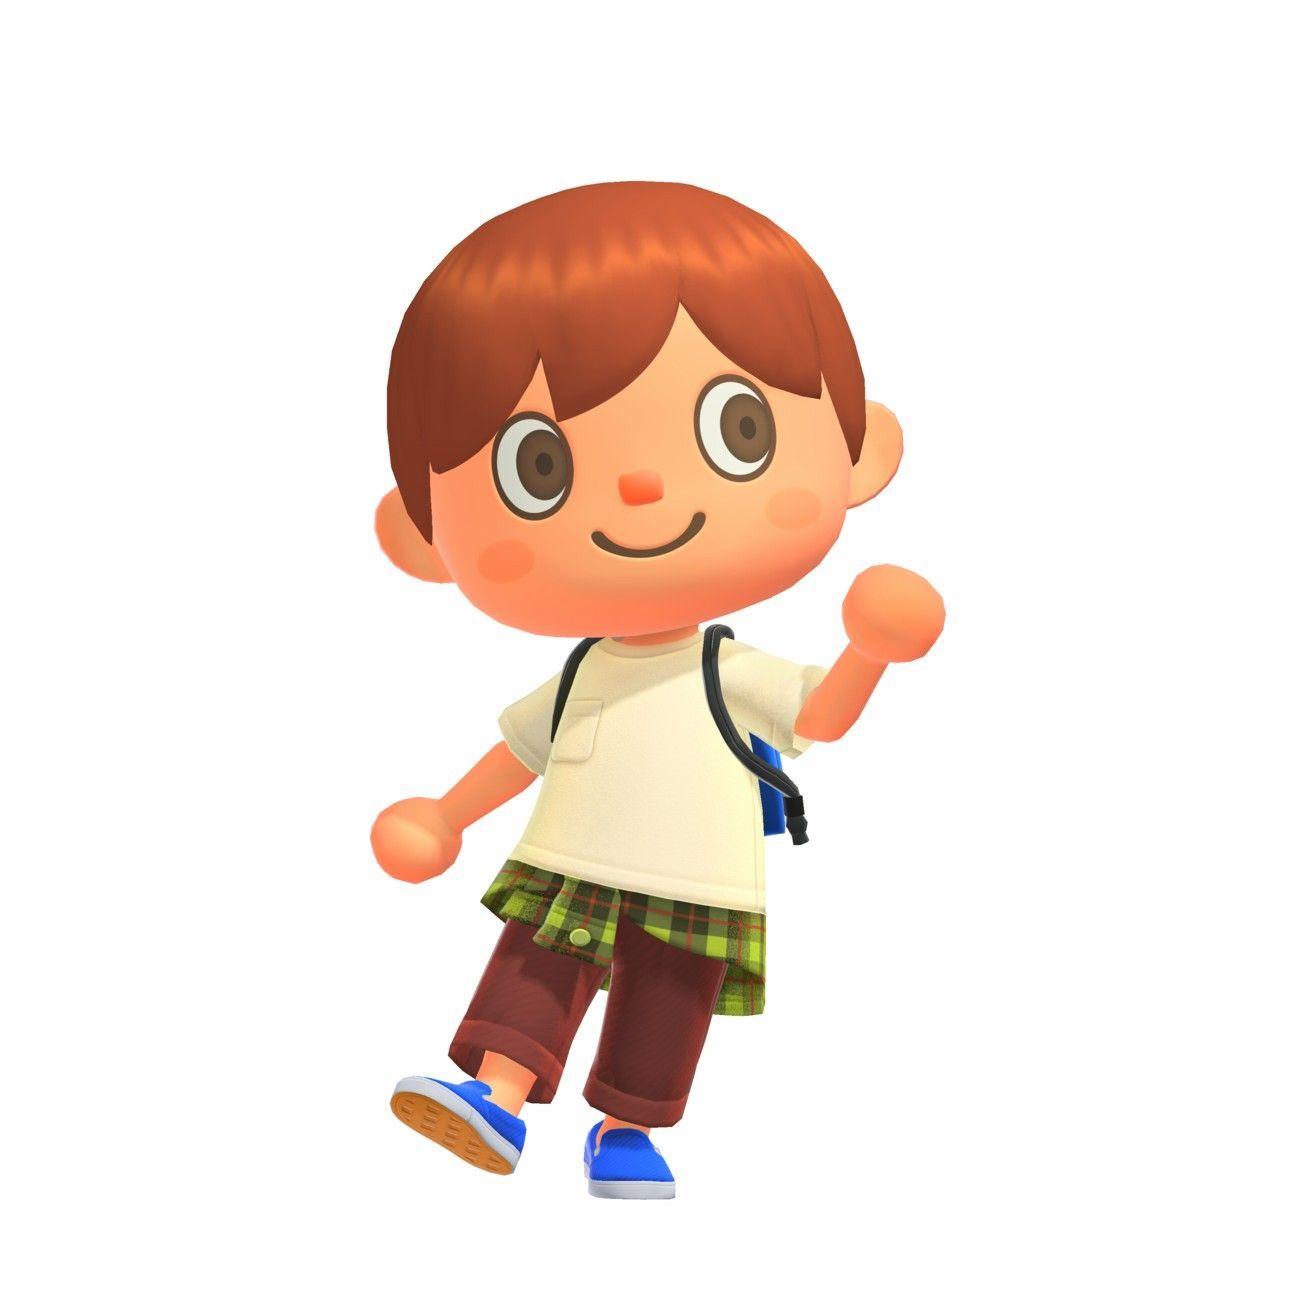 Animal Crossing New Horizons Zeigt Sich Mit Neuem Artwork N Switch On De In 2020 New Animal Crossing Animal Crossing Animal Crossing Characters